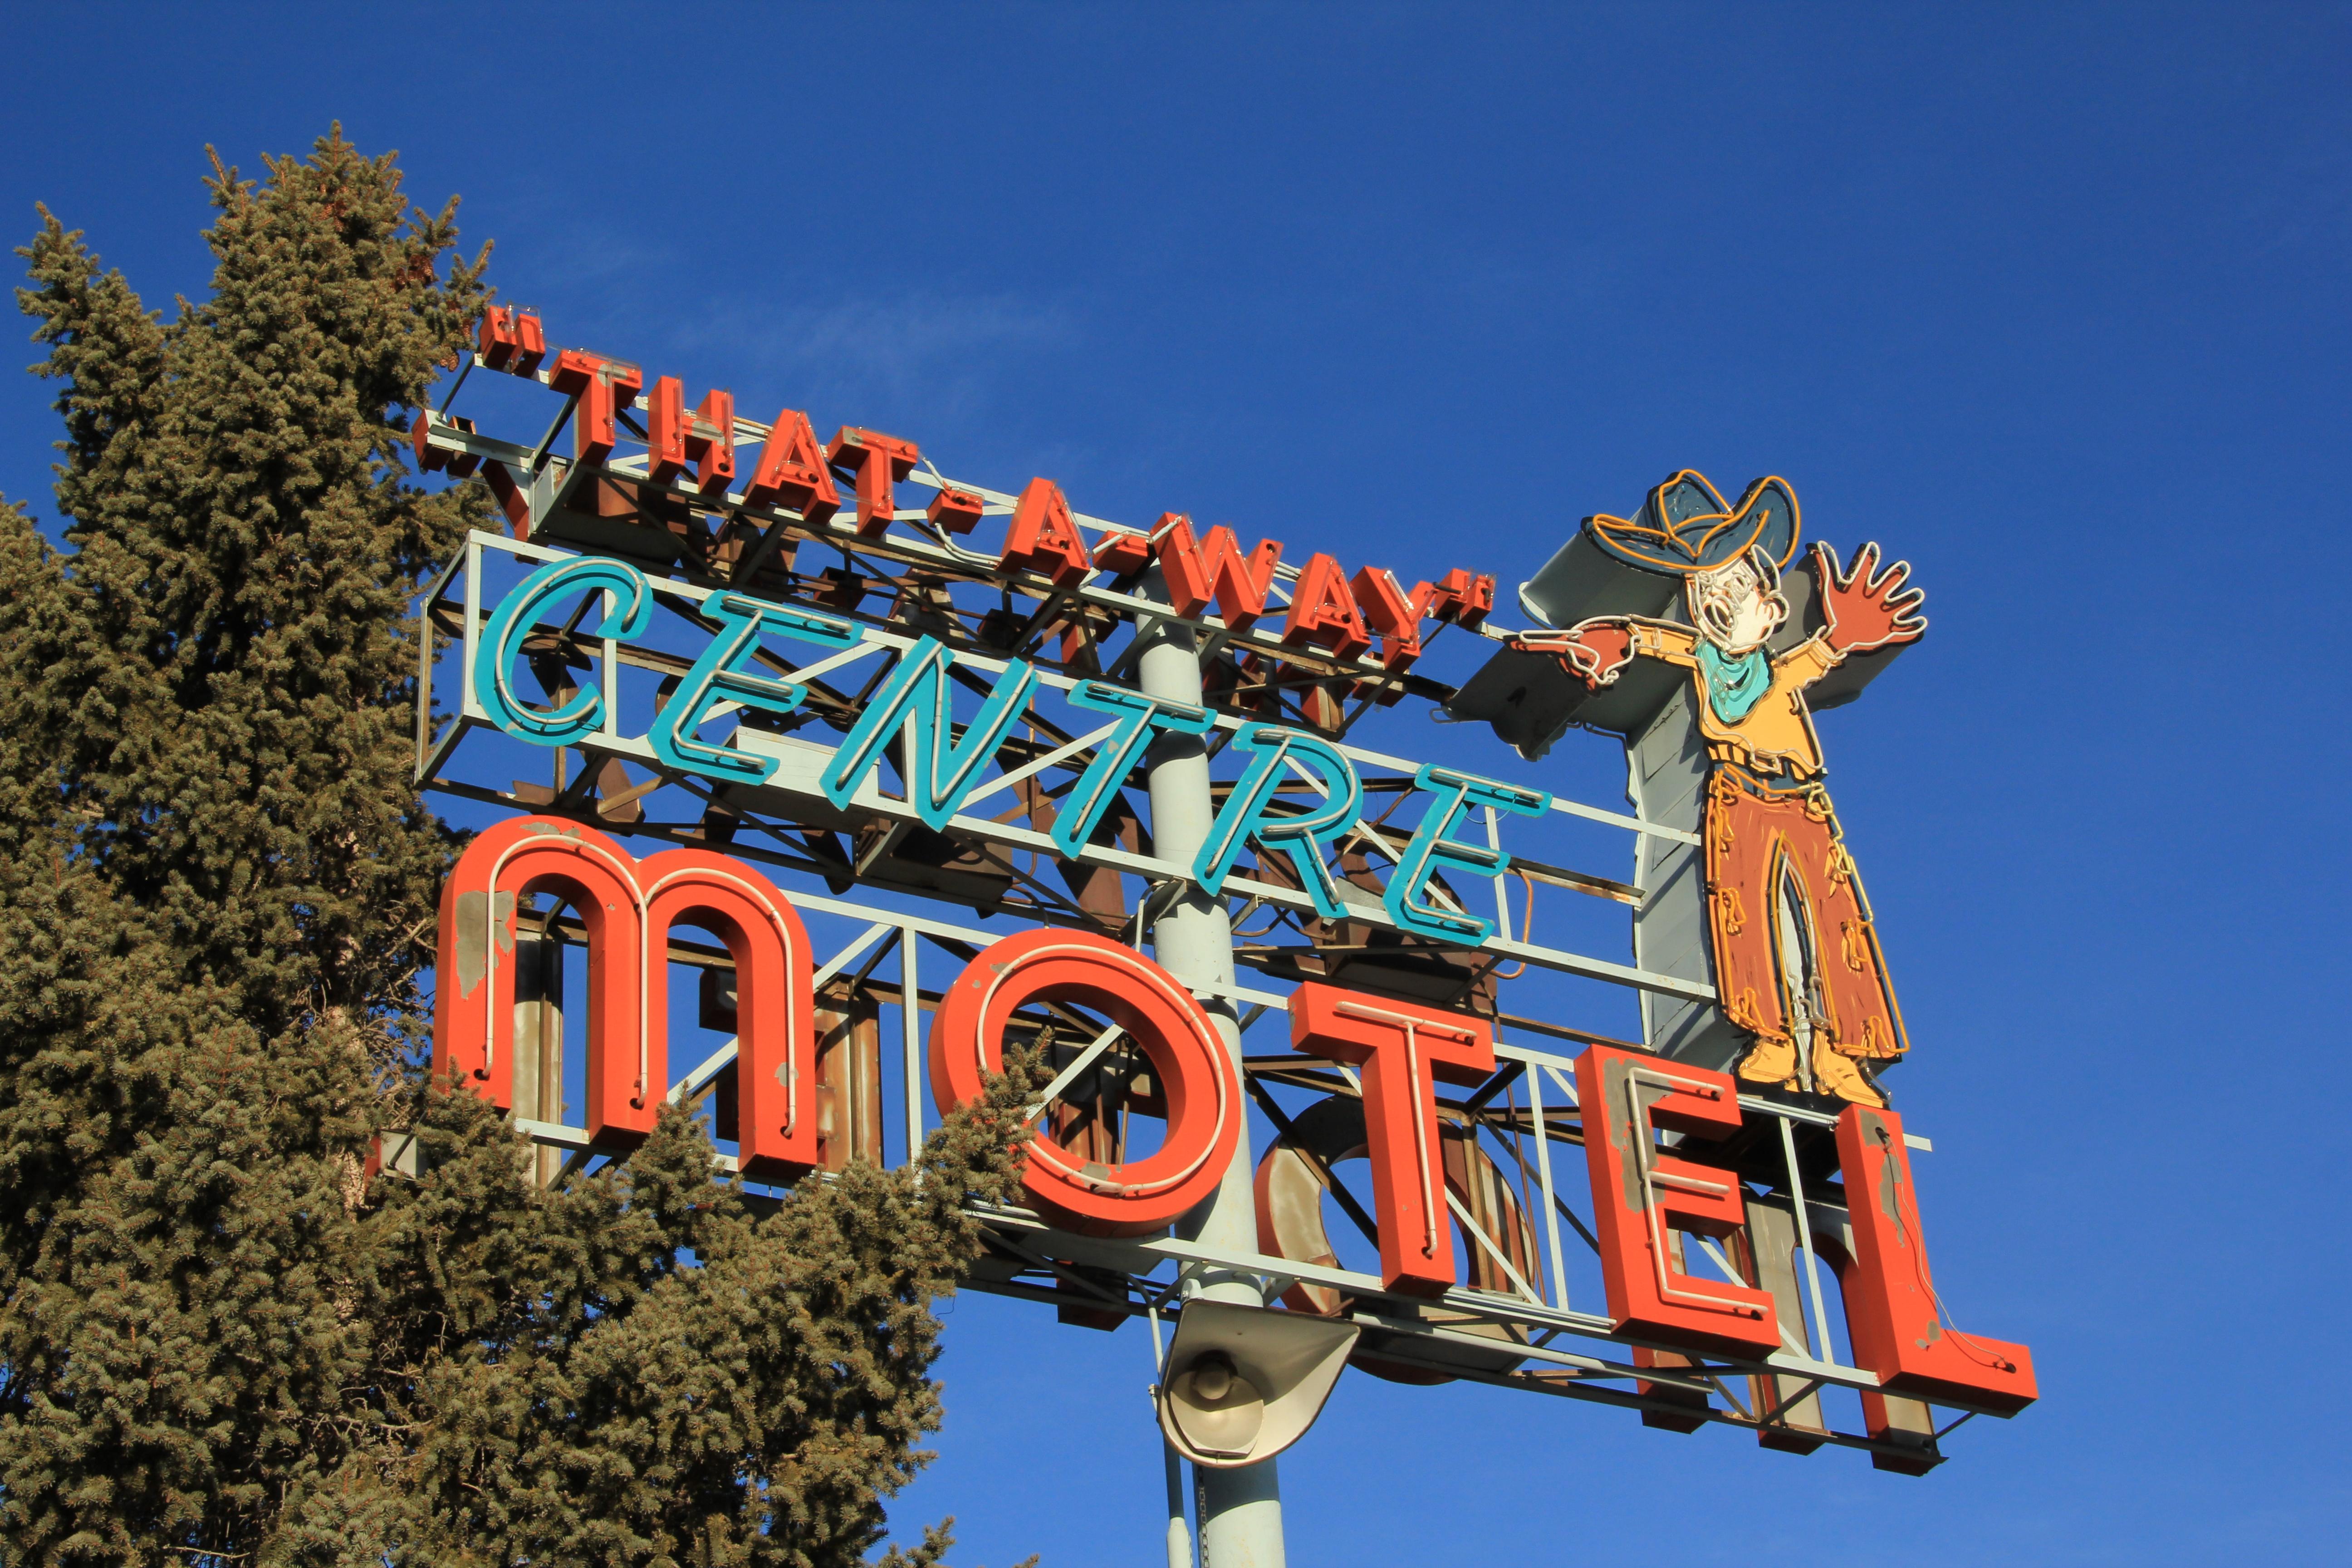 Centre Motel – 475 3rd Street, Elko, Nevada U.S.A. – January 26, 2011